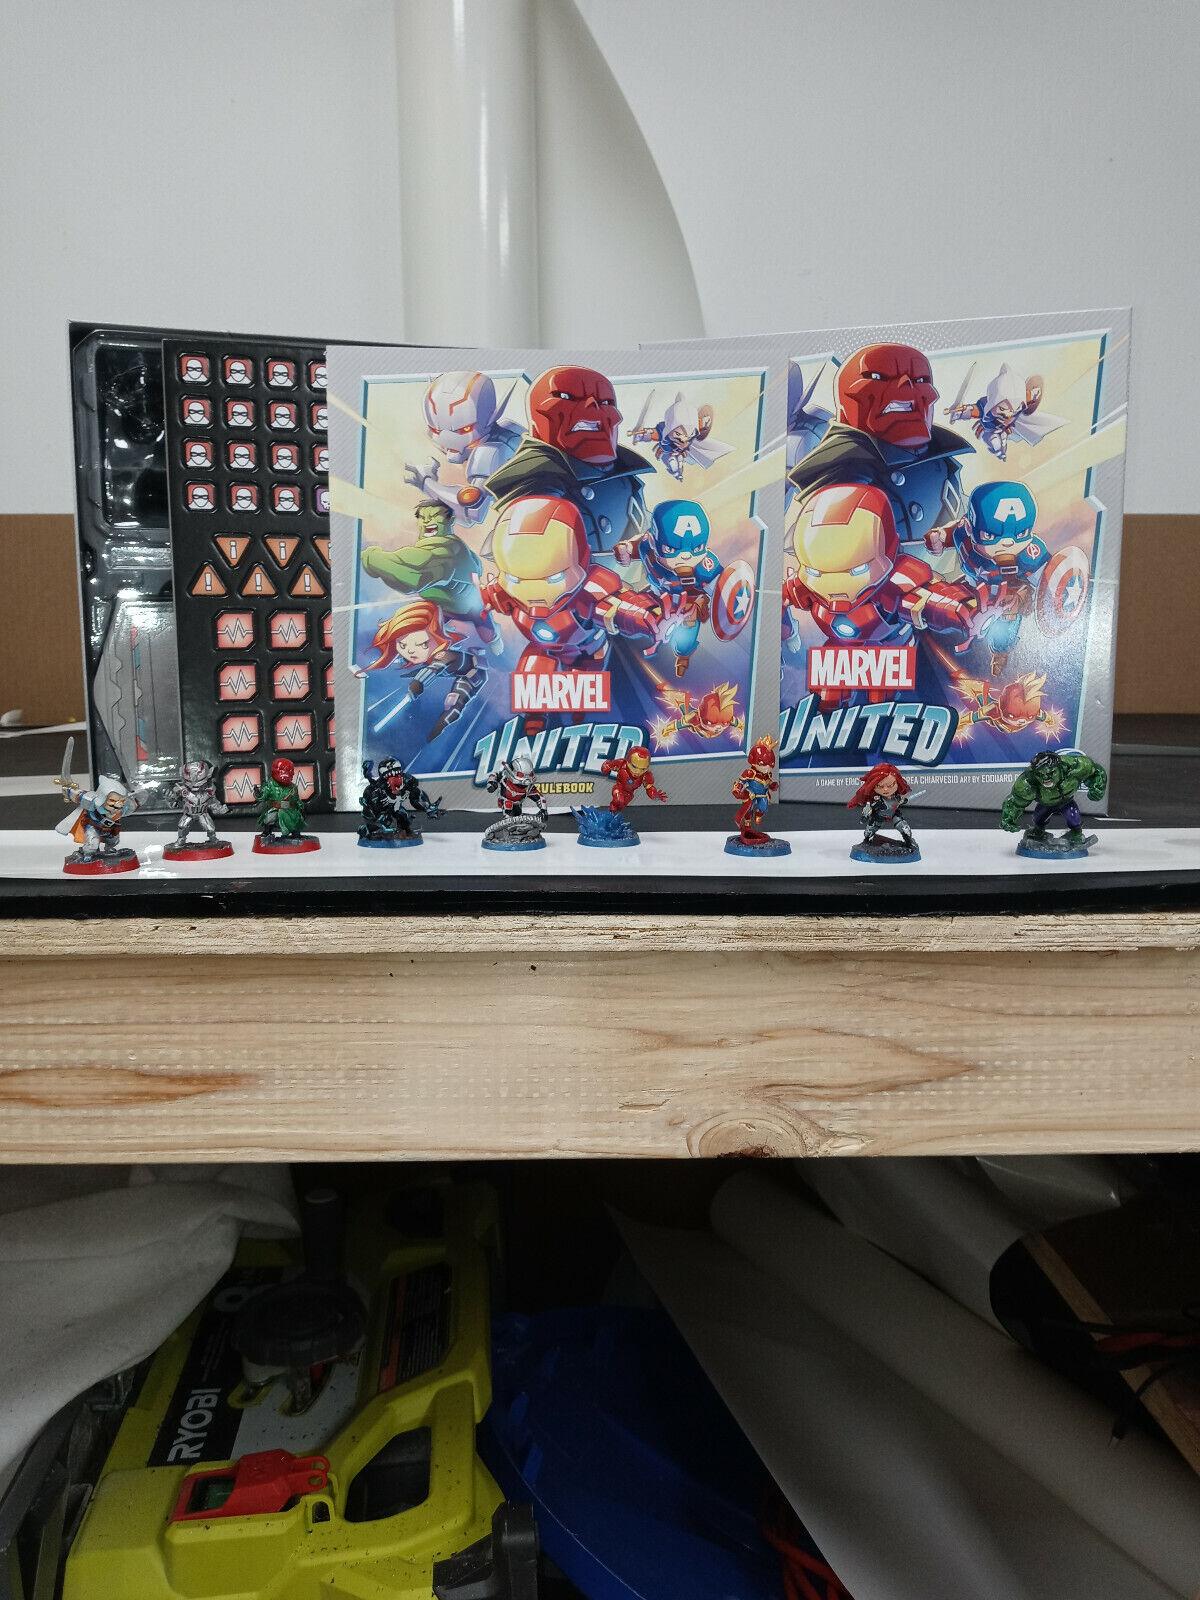 Marvel United Core 100% Painted - Walmart exclusive: Venom -